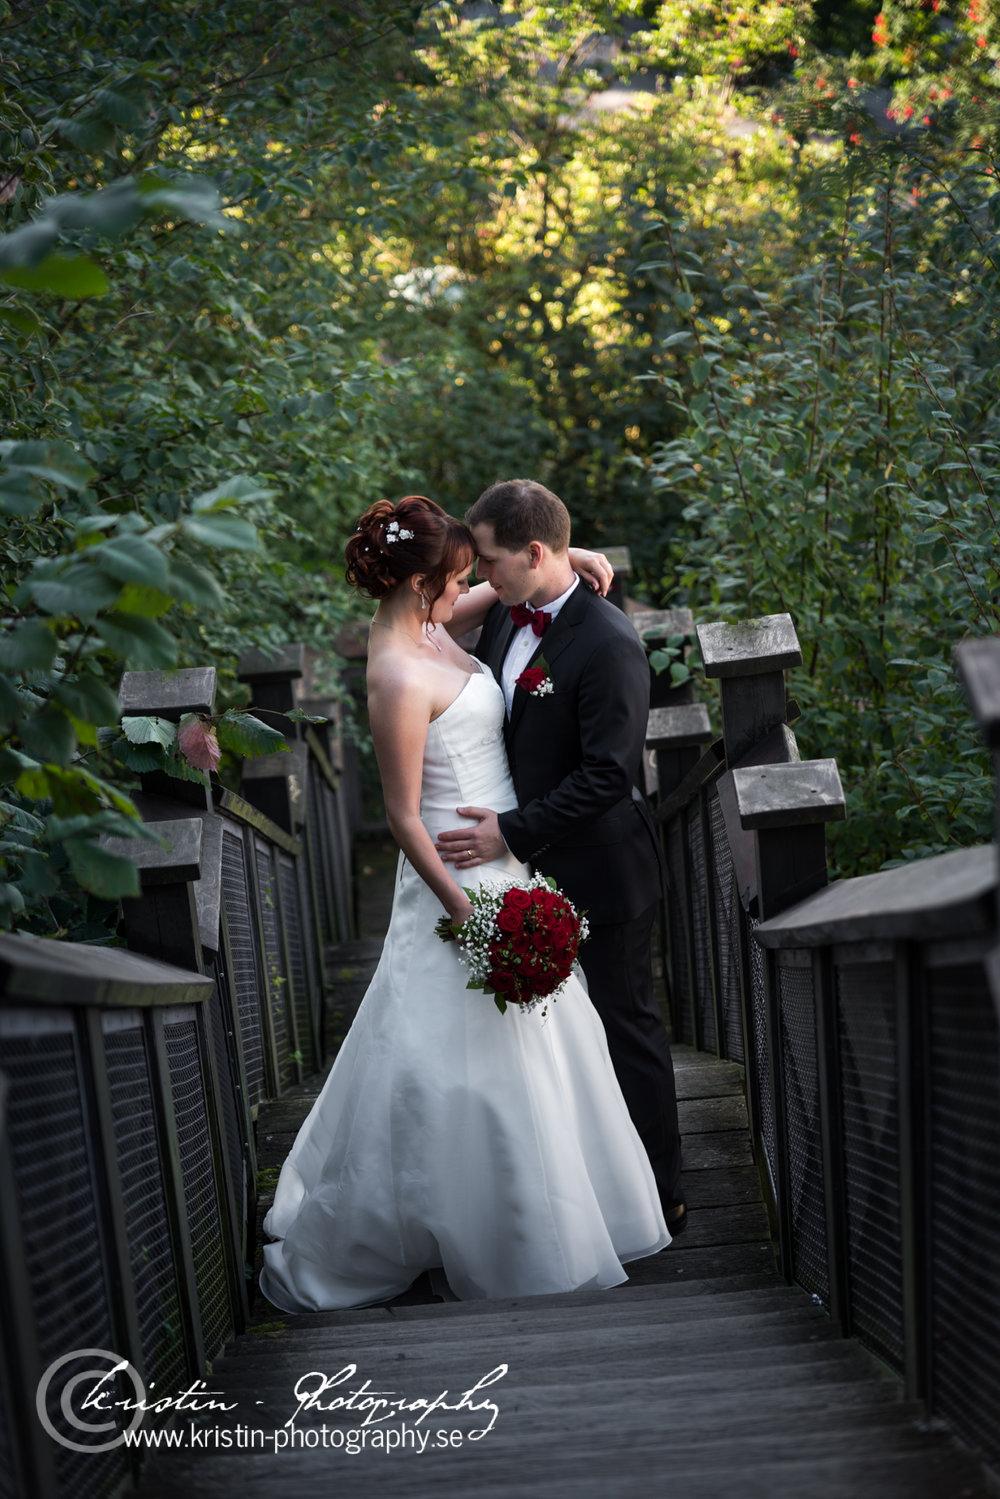 Bröllopsfotograf i Stockholm, Kristin - Photography , Munchen Bryggeriet-177.jpg